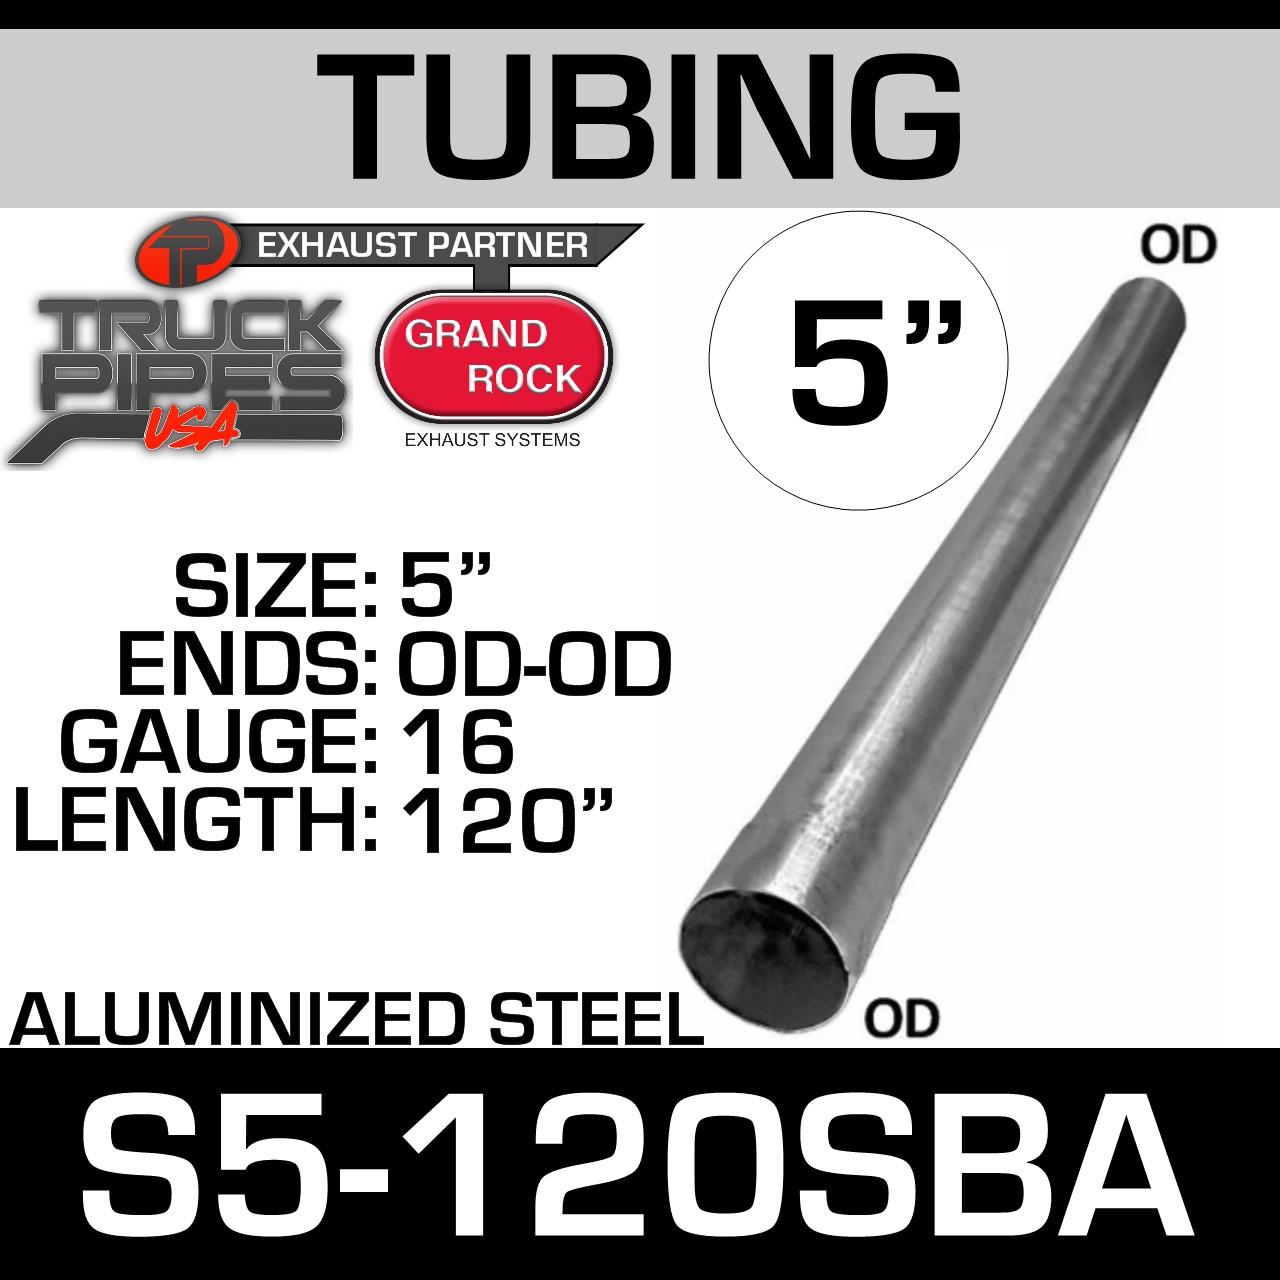 s5-120sba-aluminized-steel-exhaust-tubing-5-inch-diameter-od-end-120-inches-long.jpg